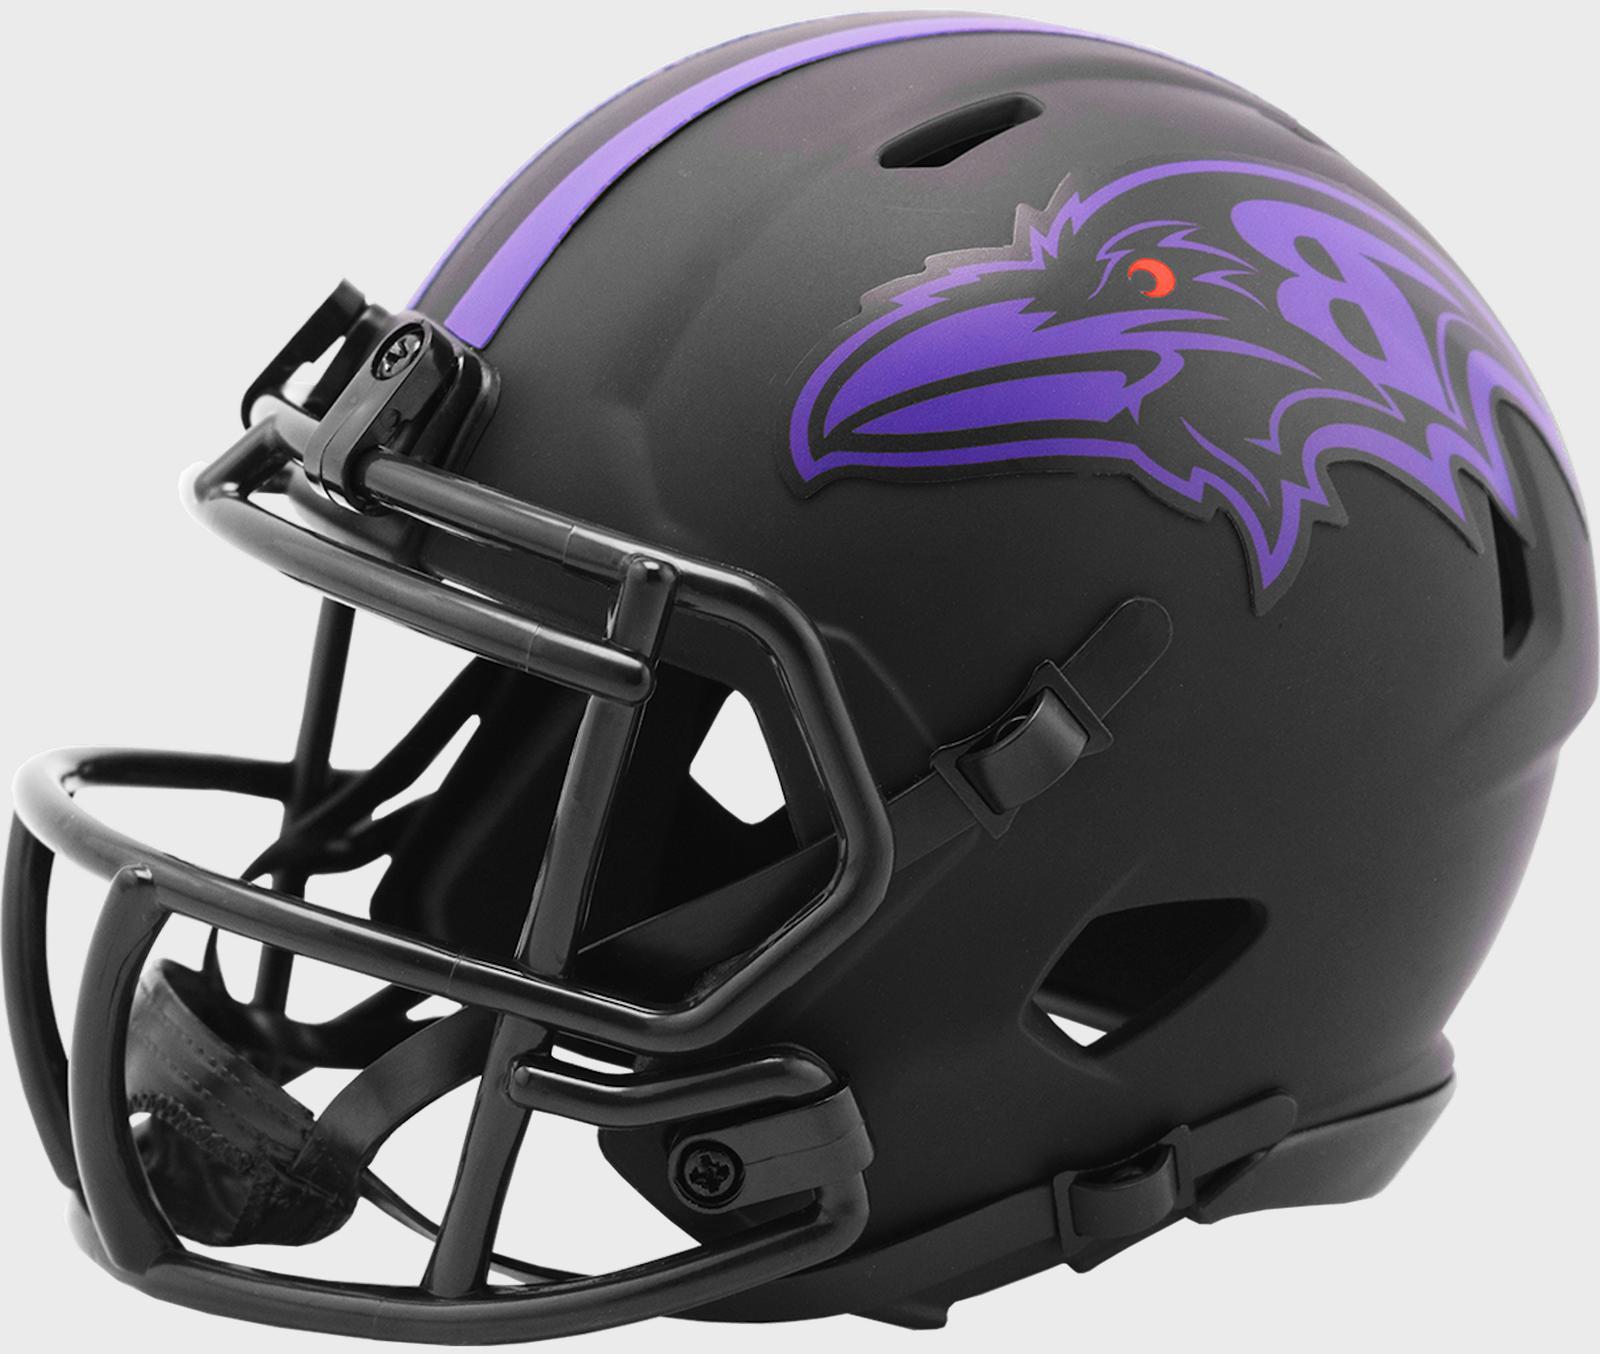 BALTIMORE RAVENS NFL Riddell SPEED Mini Football Helmet BLAC